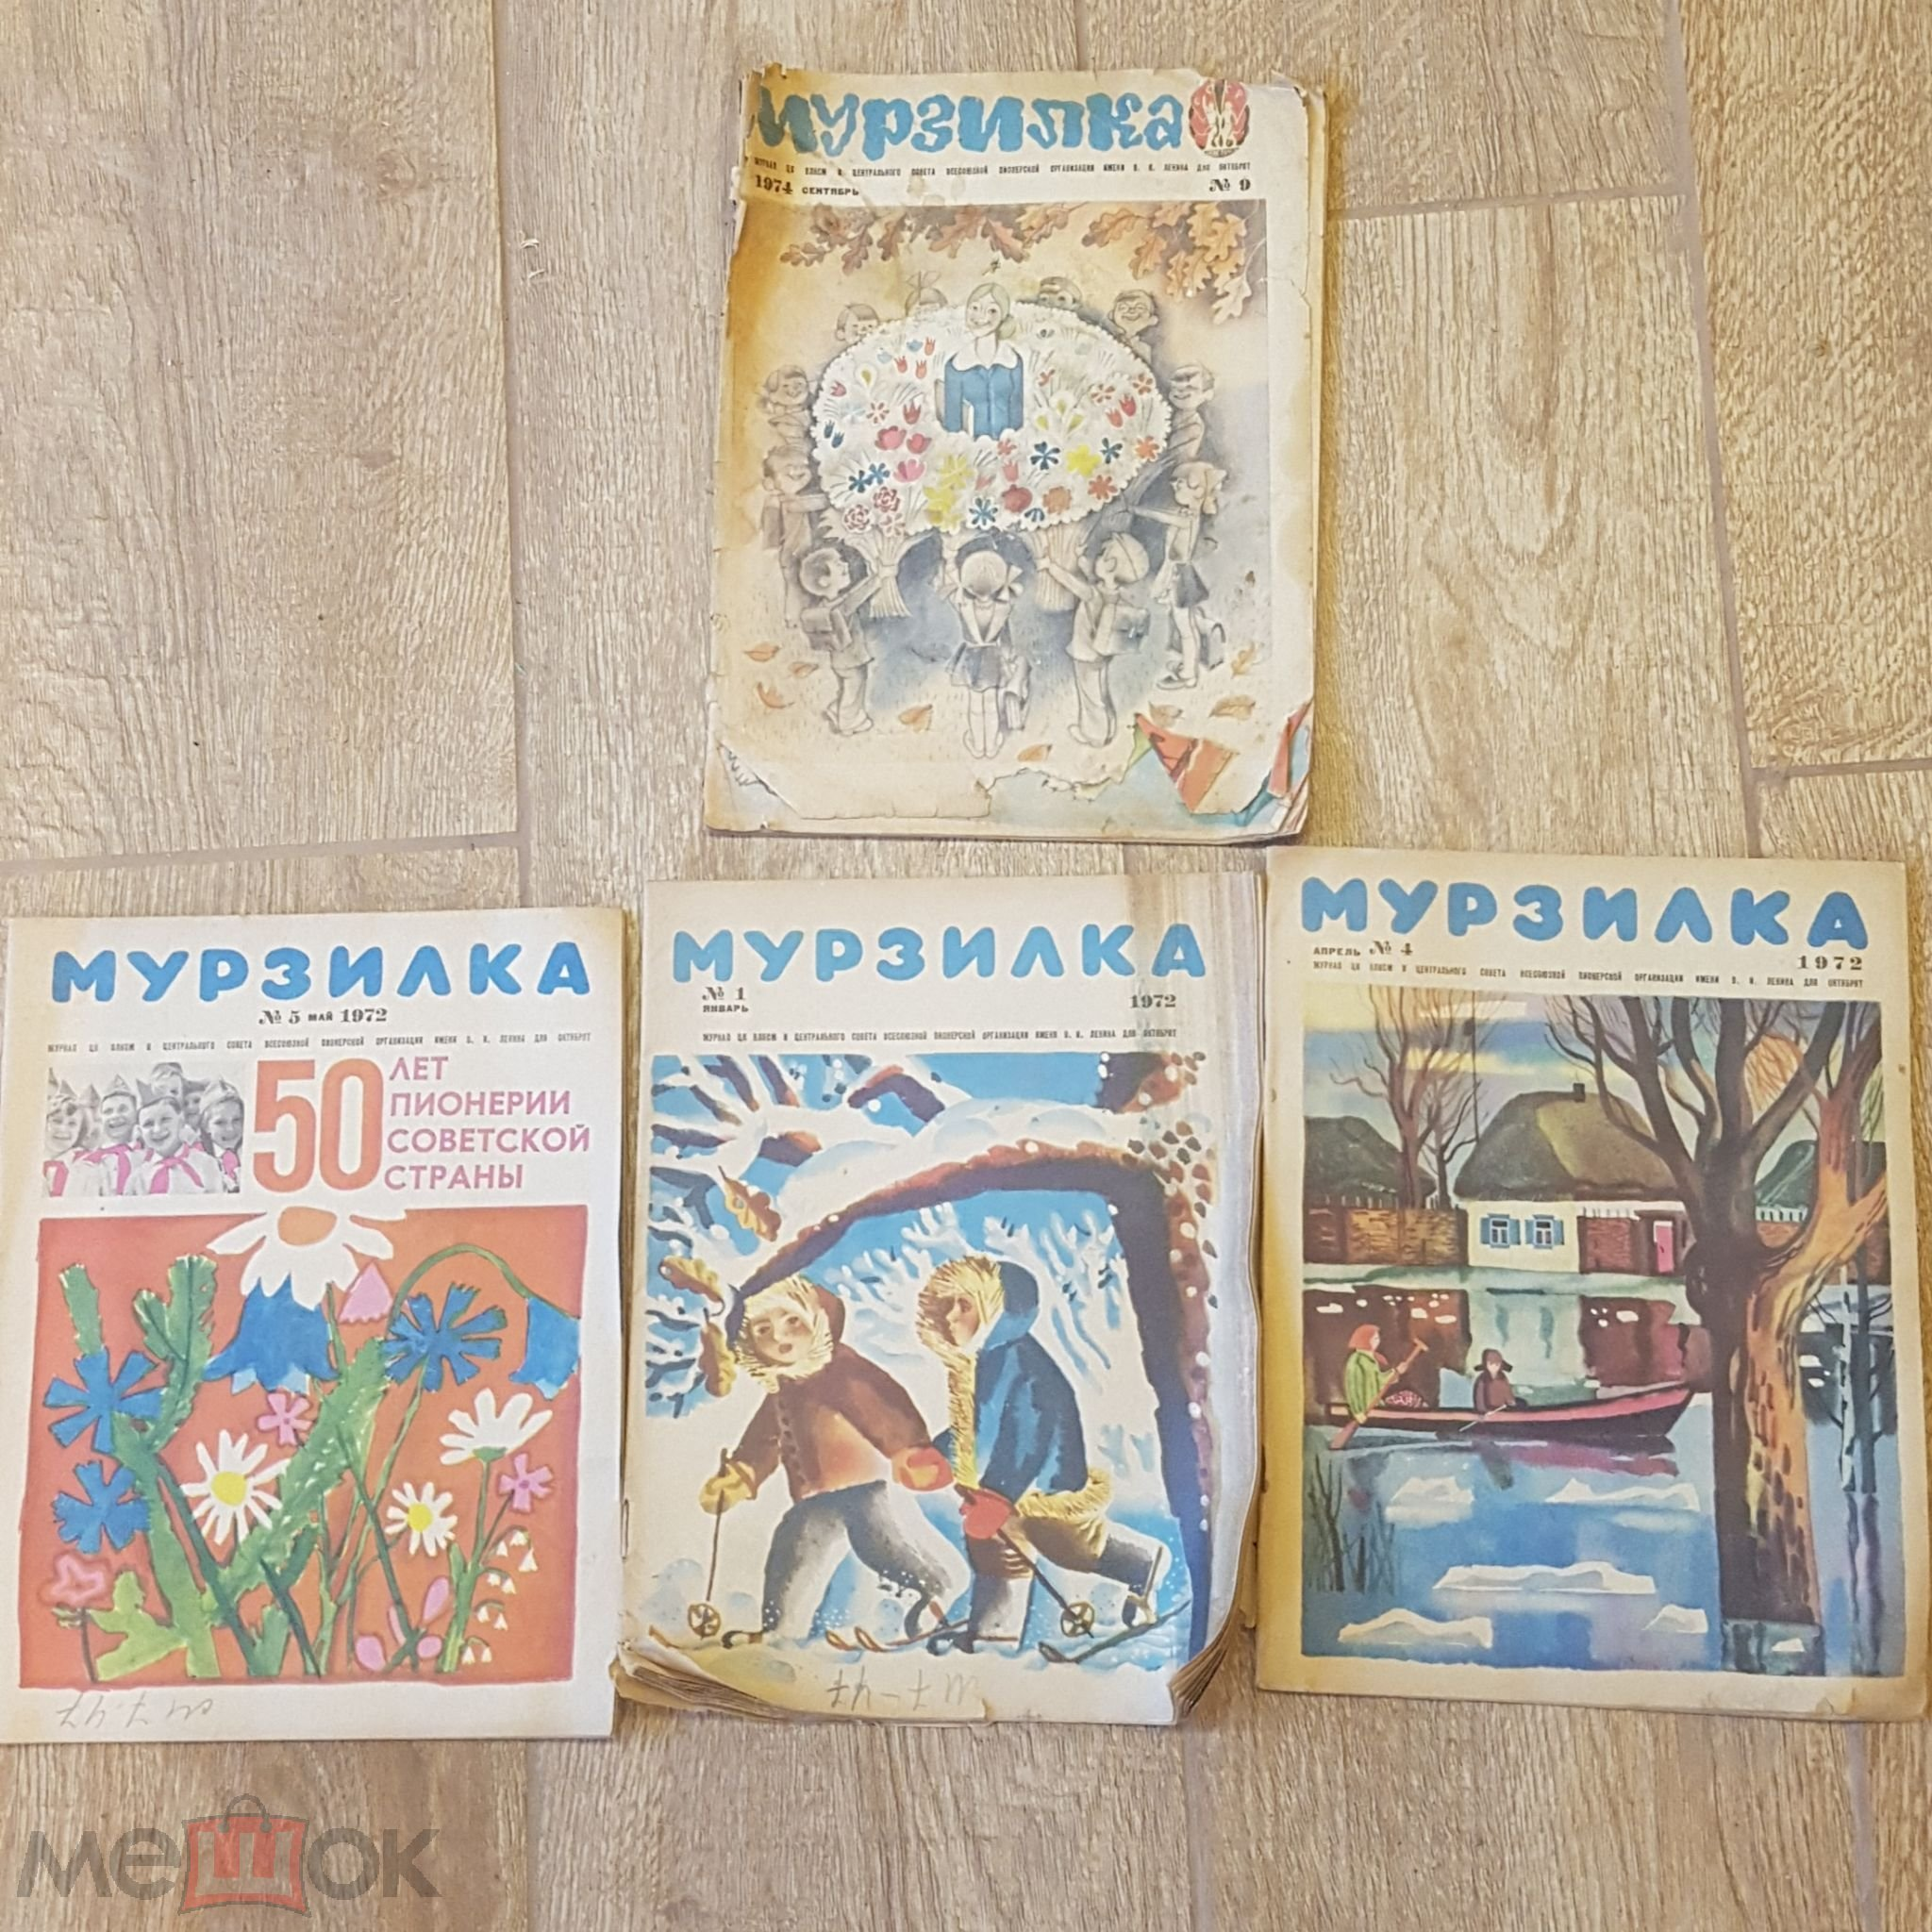 журнал Мурзилка 33 штуки 1969 ,1971, 1972, 1973, 1974 ,1978, 1979,1980,1881, 1983 год